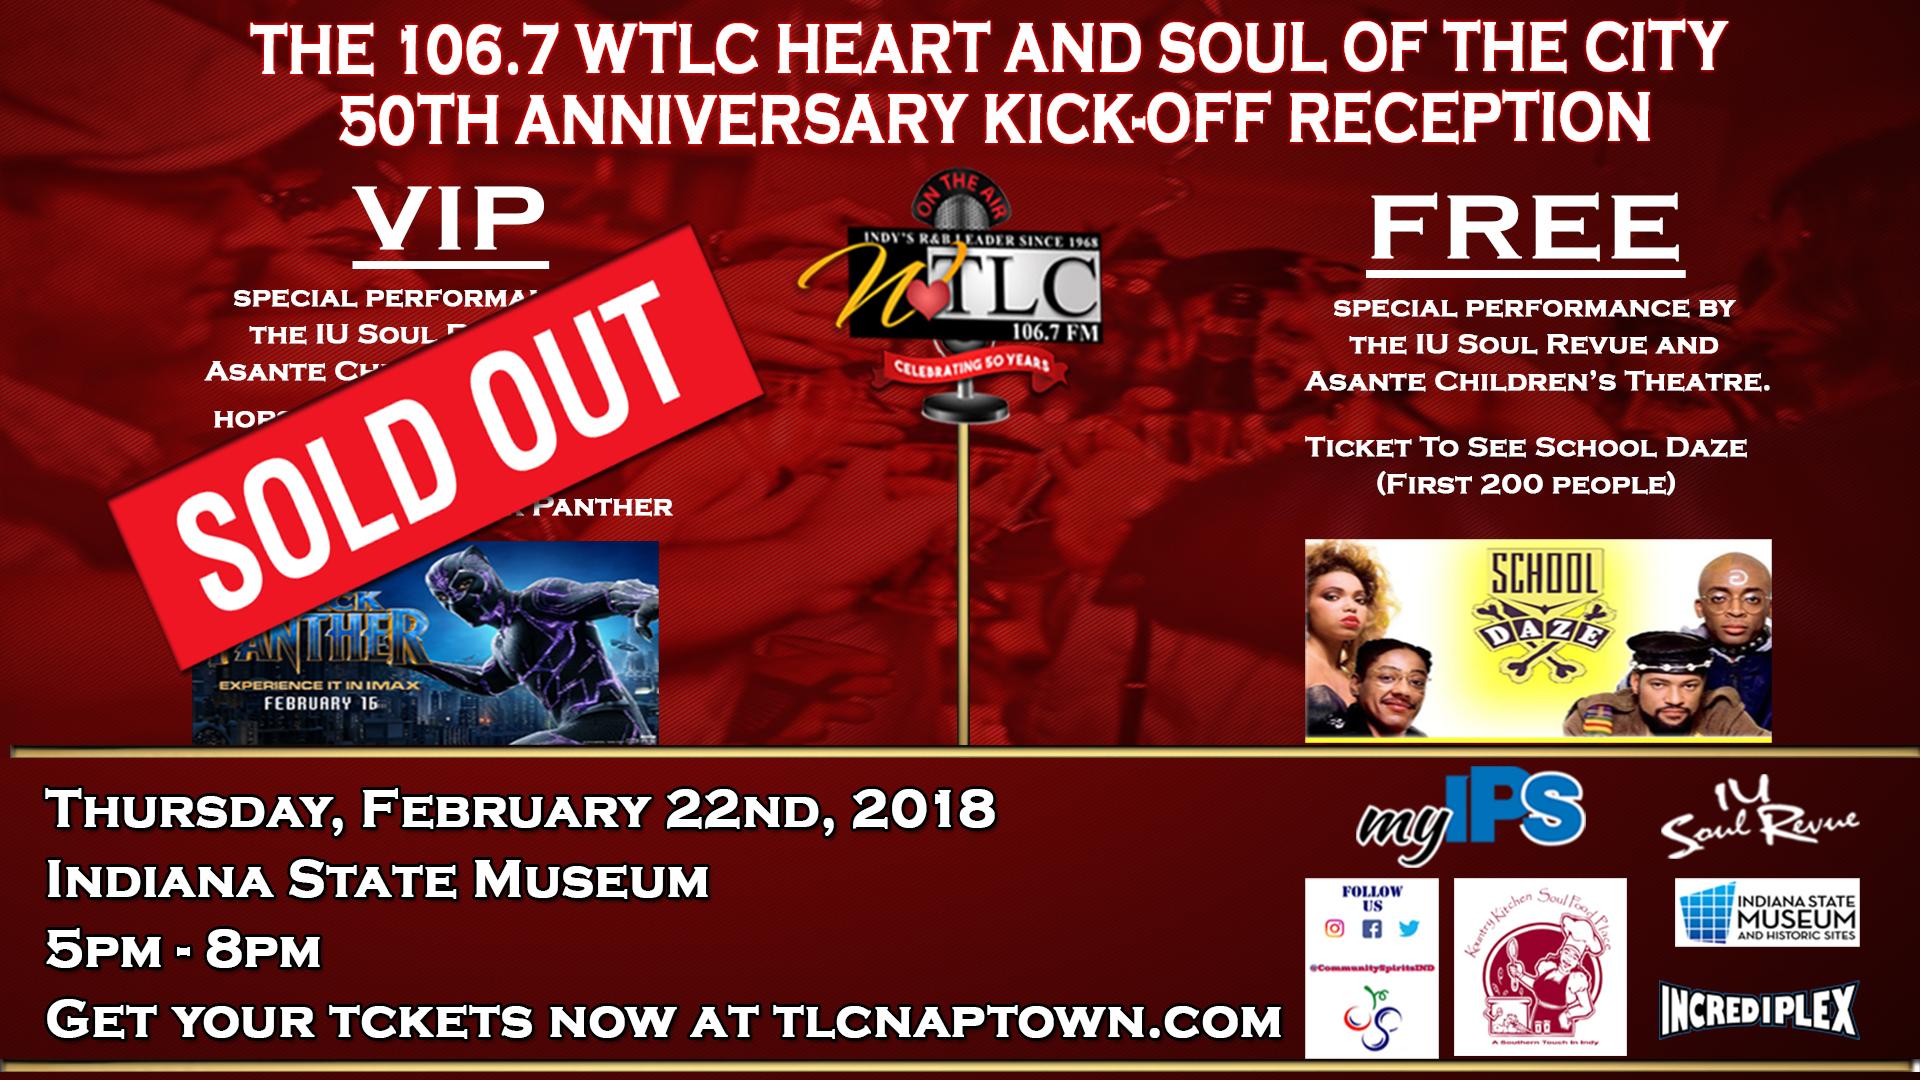 WTLC 50th Anniversary Kick-Off Reception Flyer